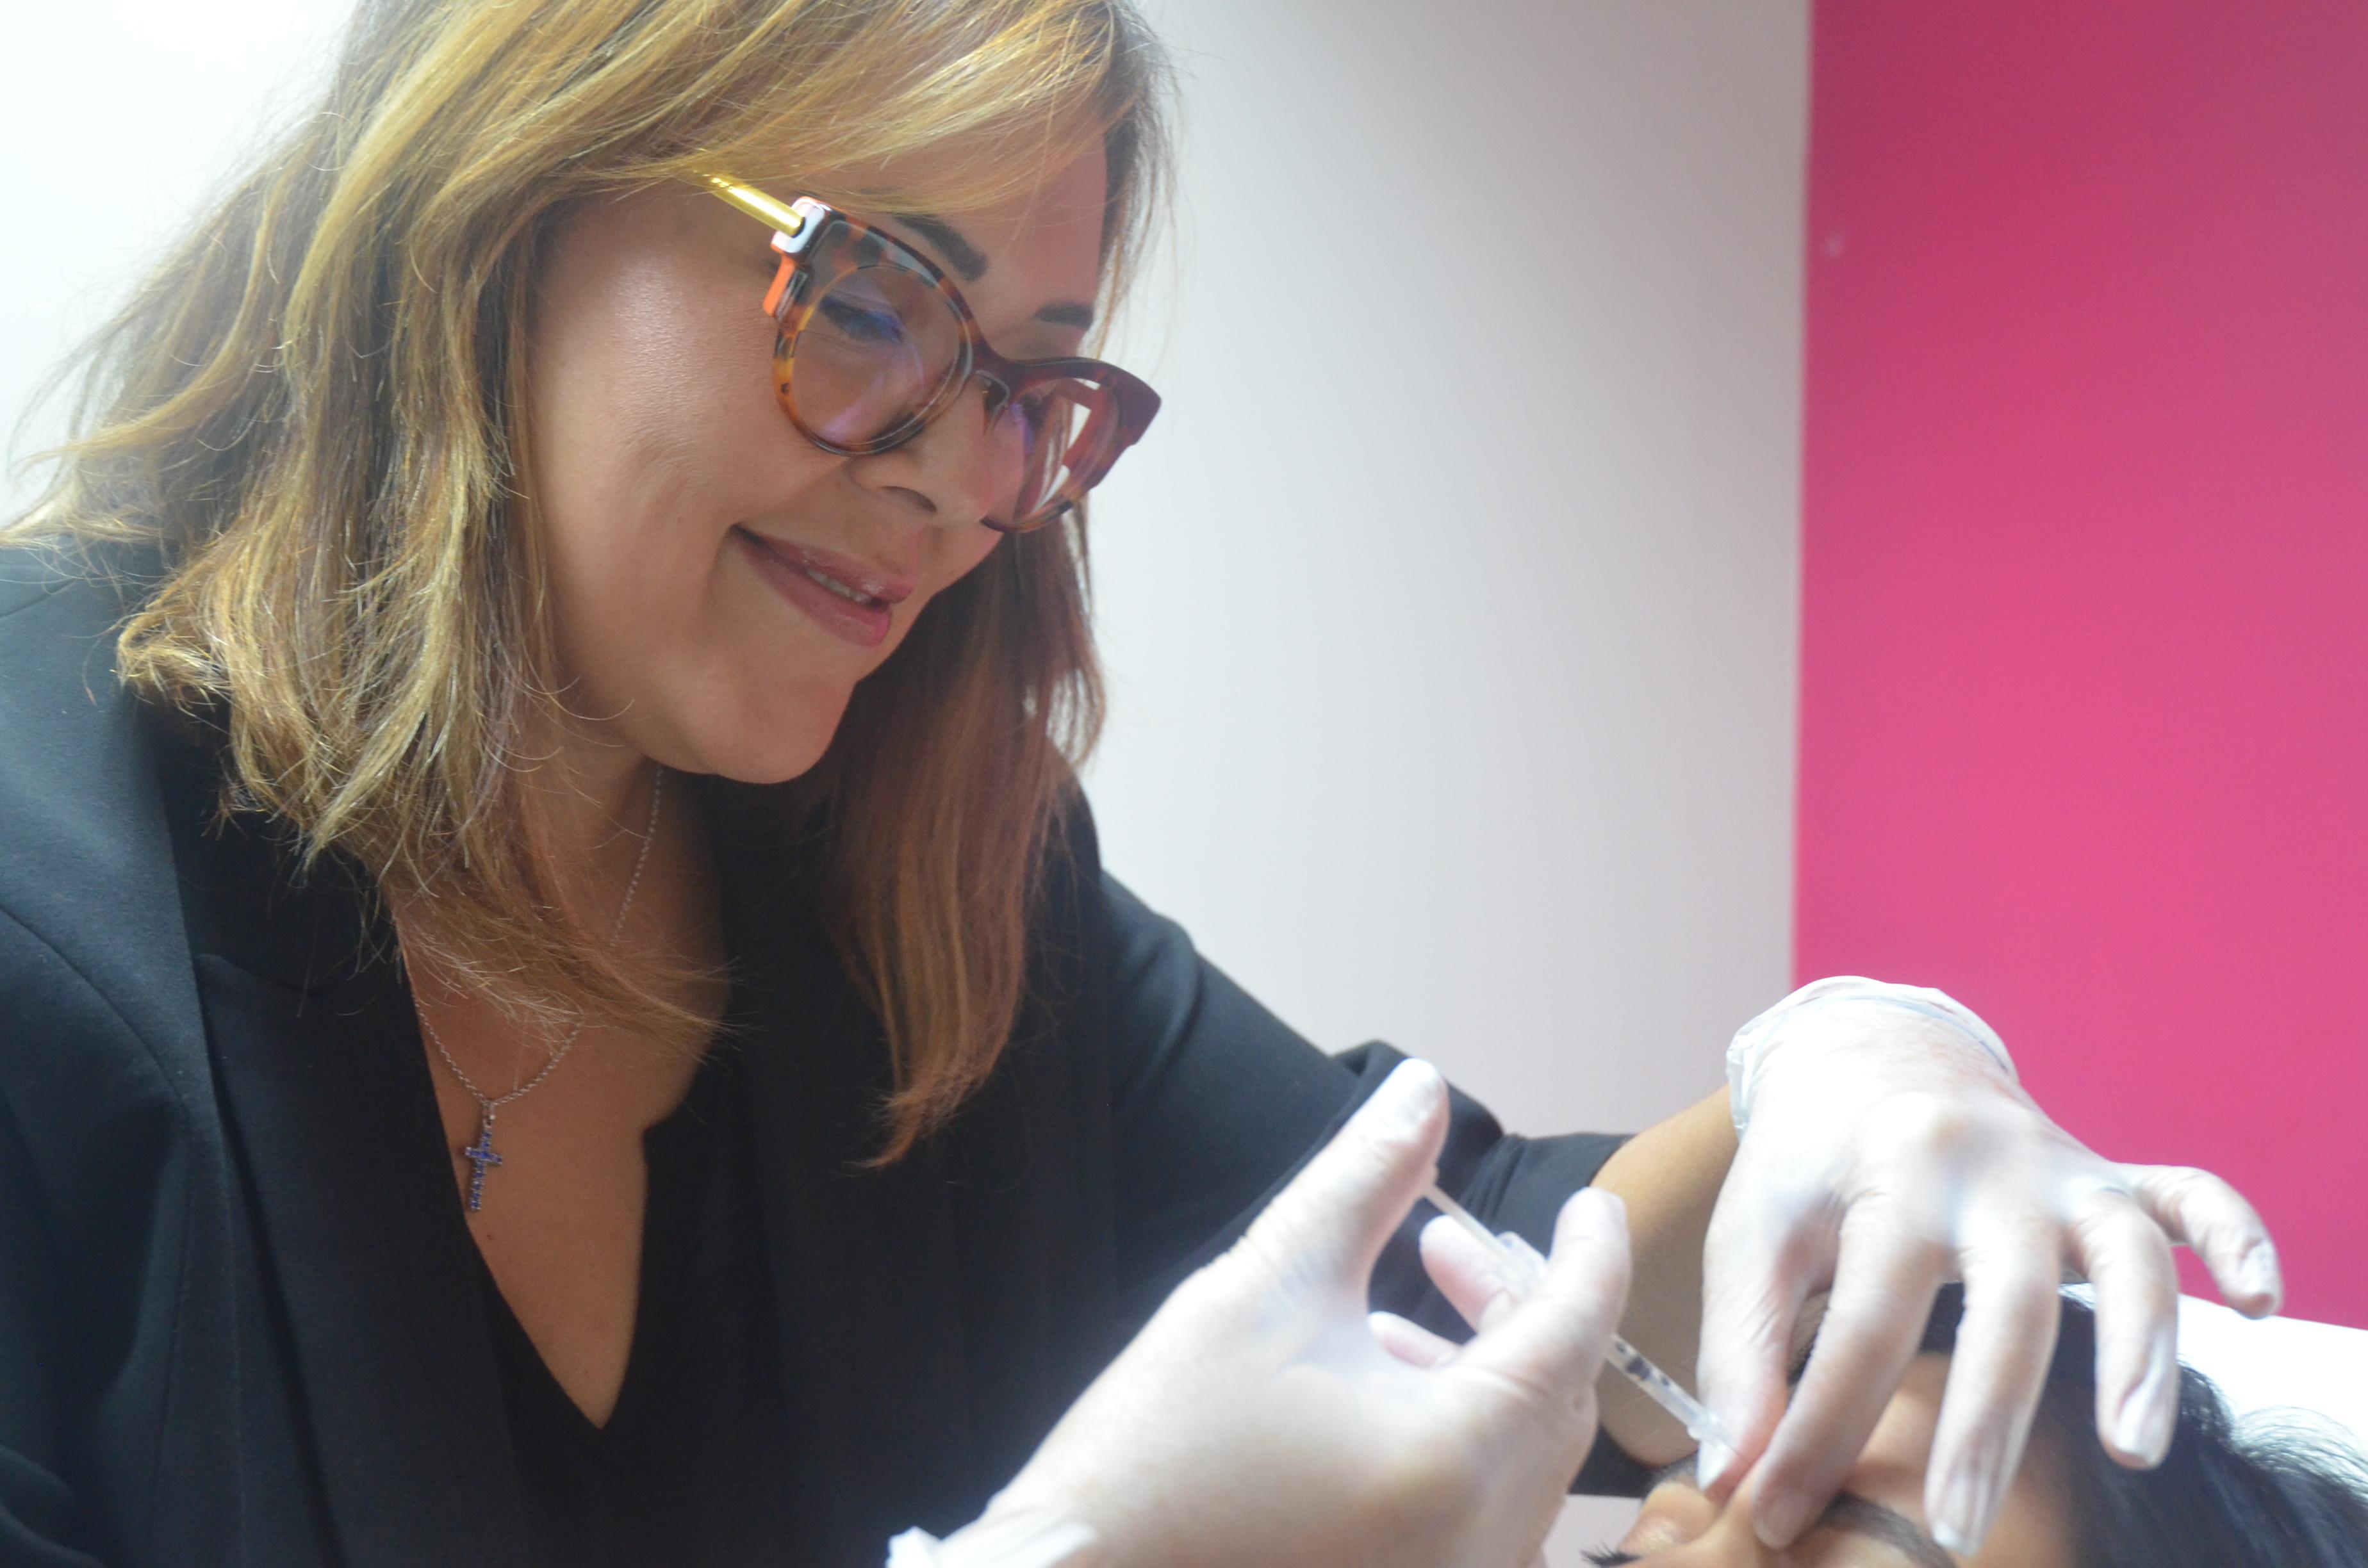 Nurse Taryn injecting a patient